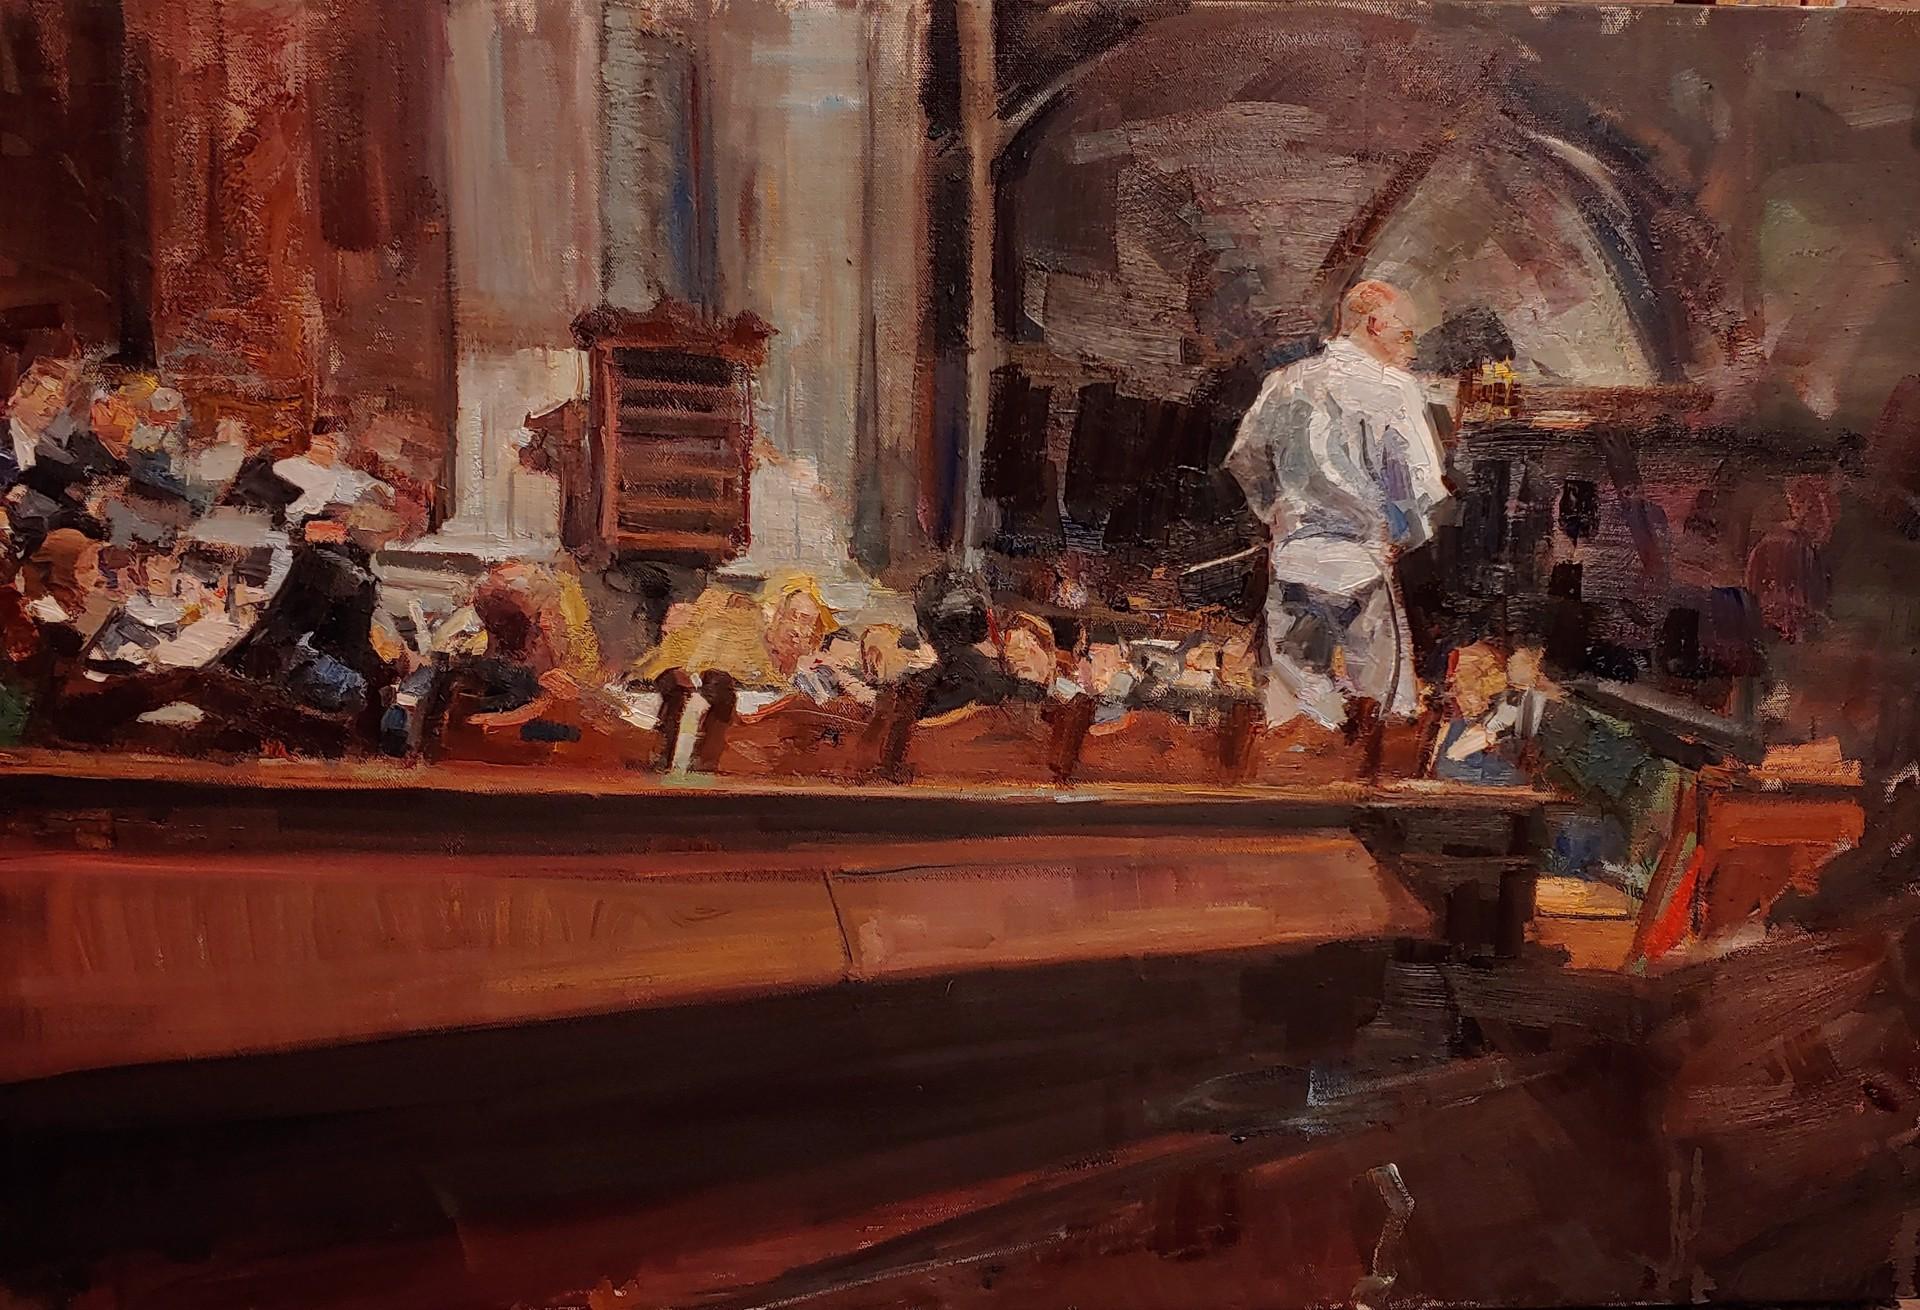 Rehearsal by Mikael Olson